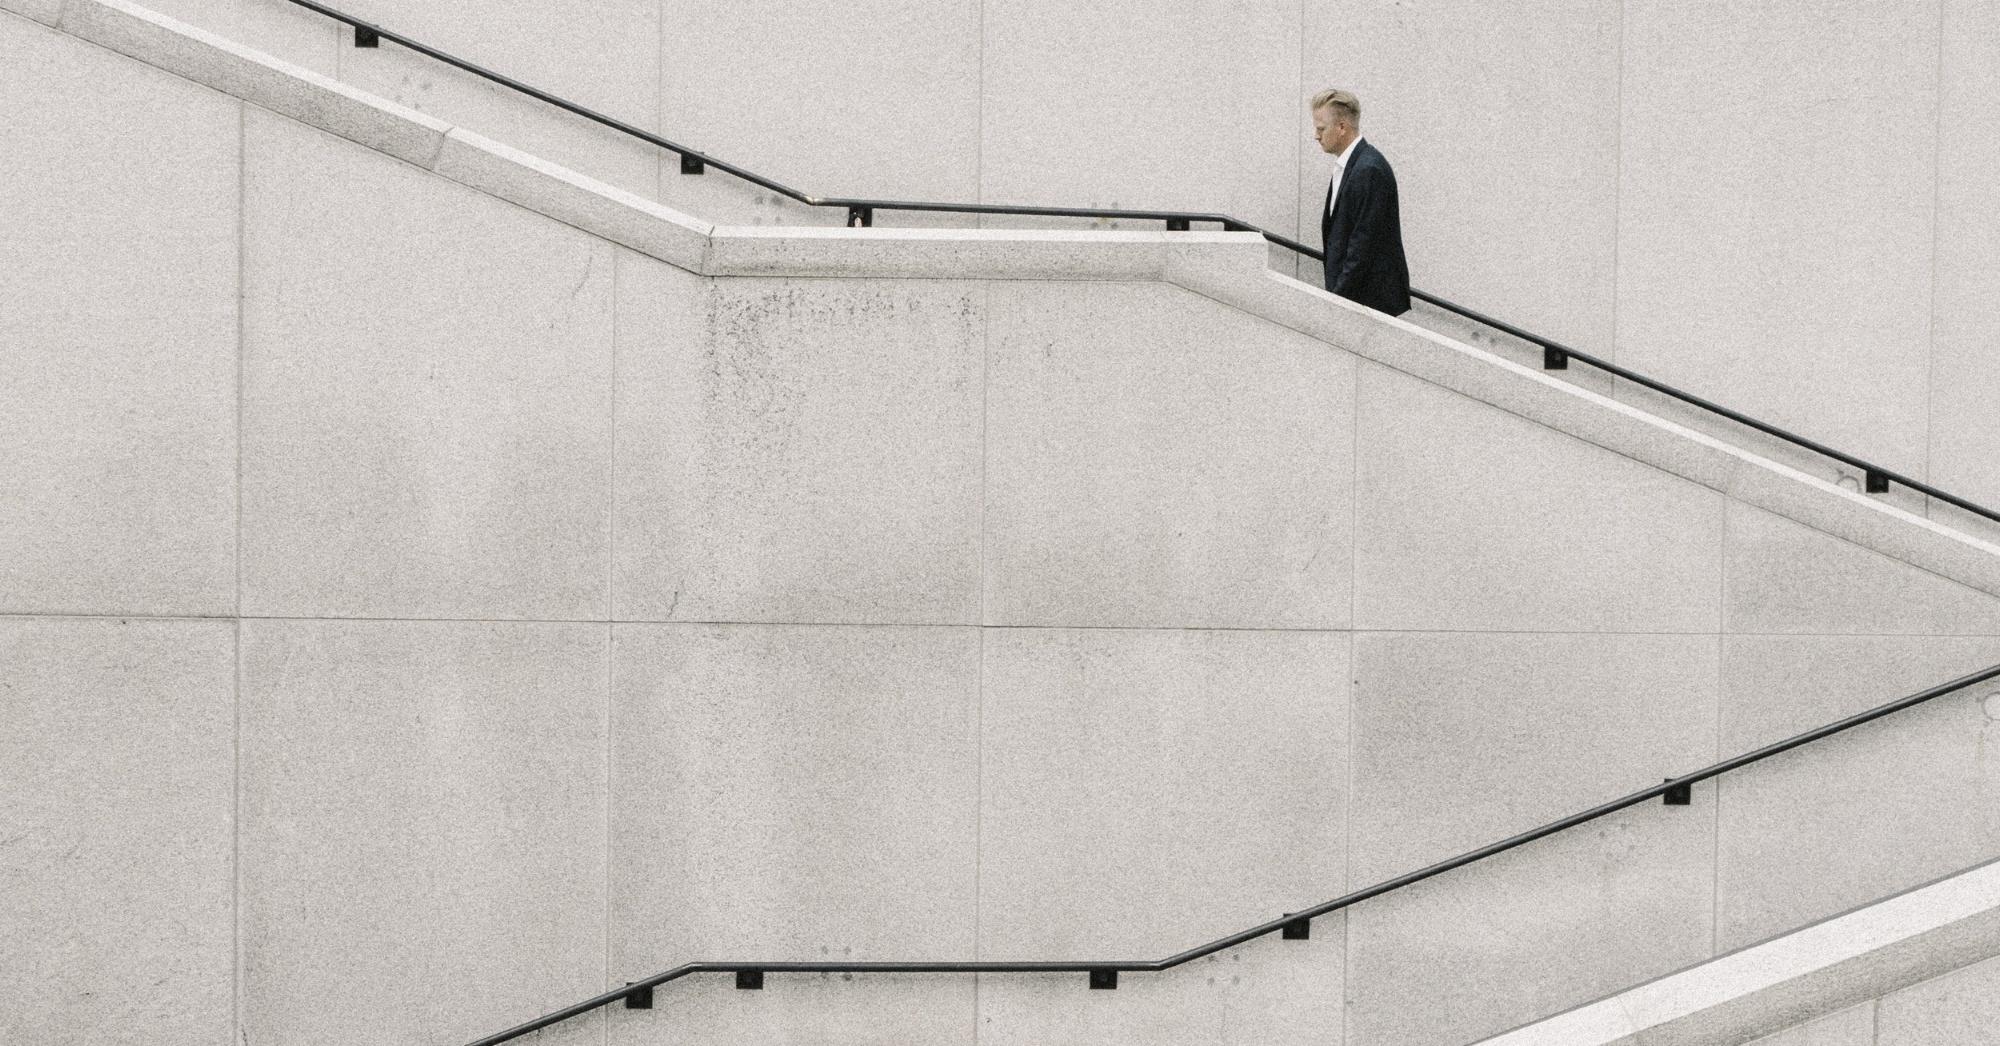 Preparing for GDPR – Burden or Opportunity?